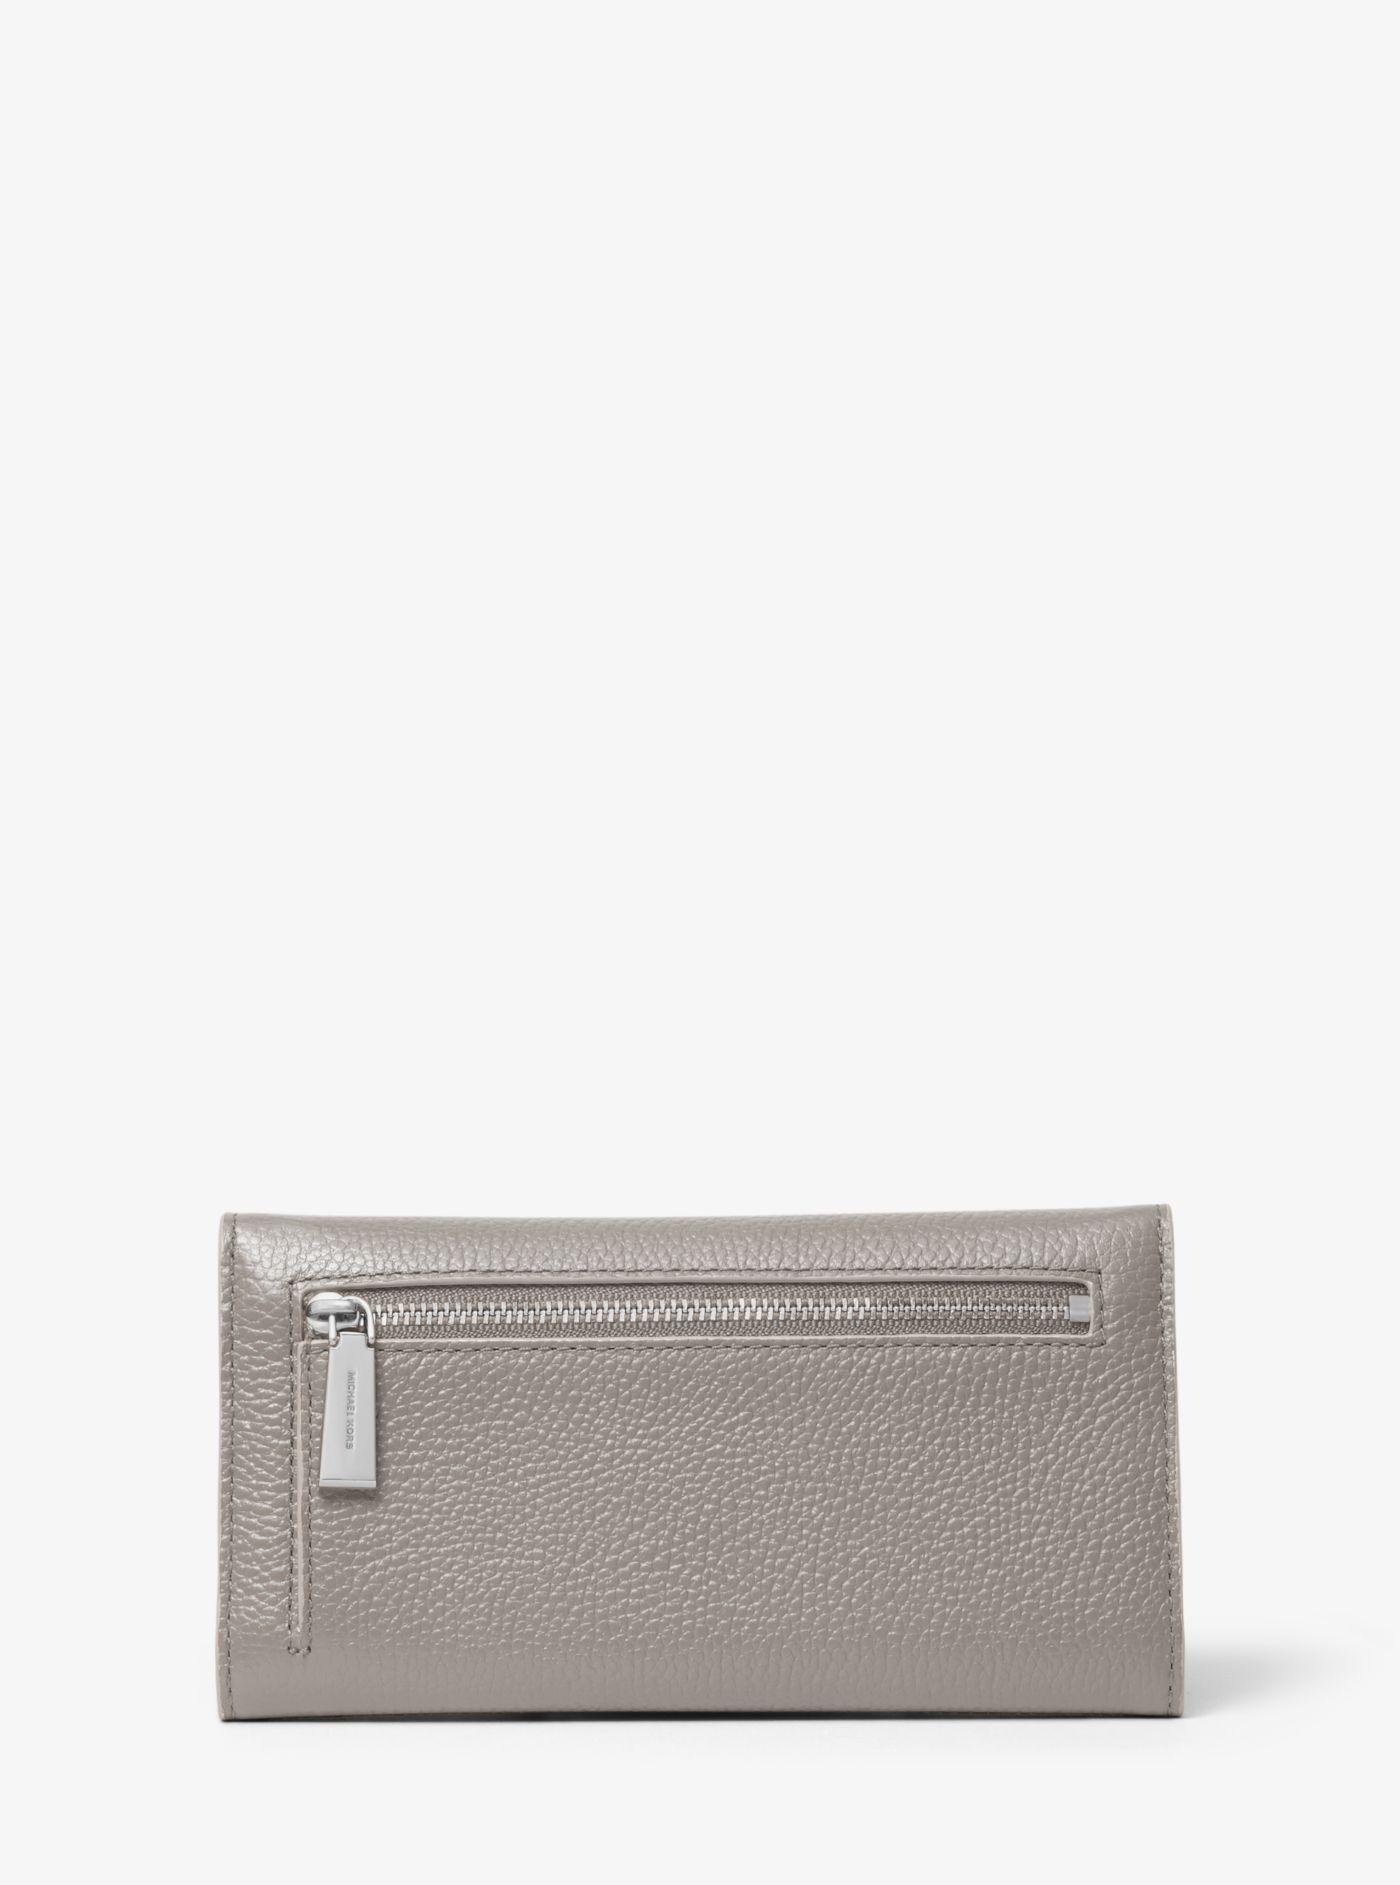 c4281483fb7b Michael Kors - Gray Large Two-tone Pebbled Leather Envelope Wallet - Lyst.  View fullscreen